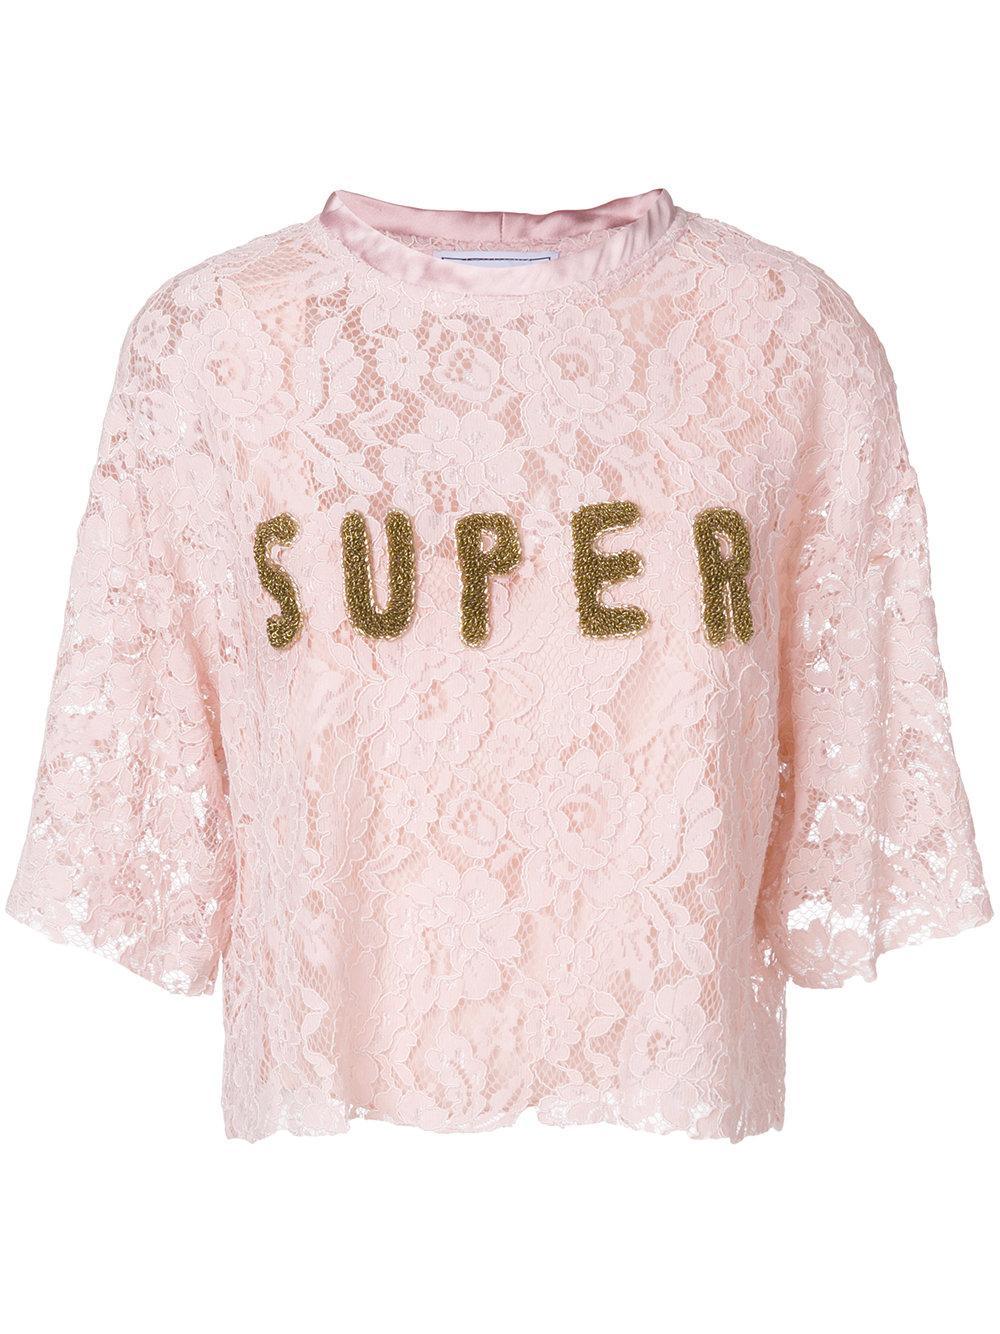 Forte Couture Super Lace Blouse